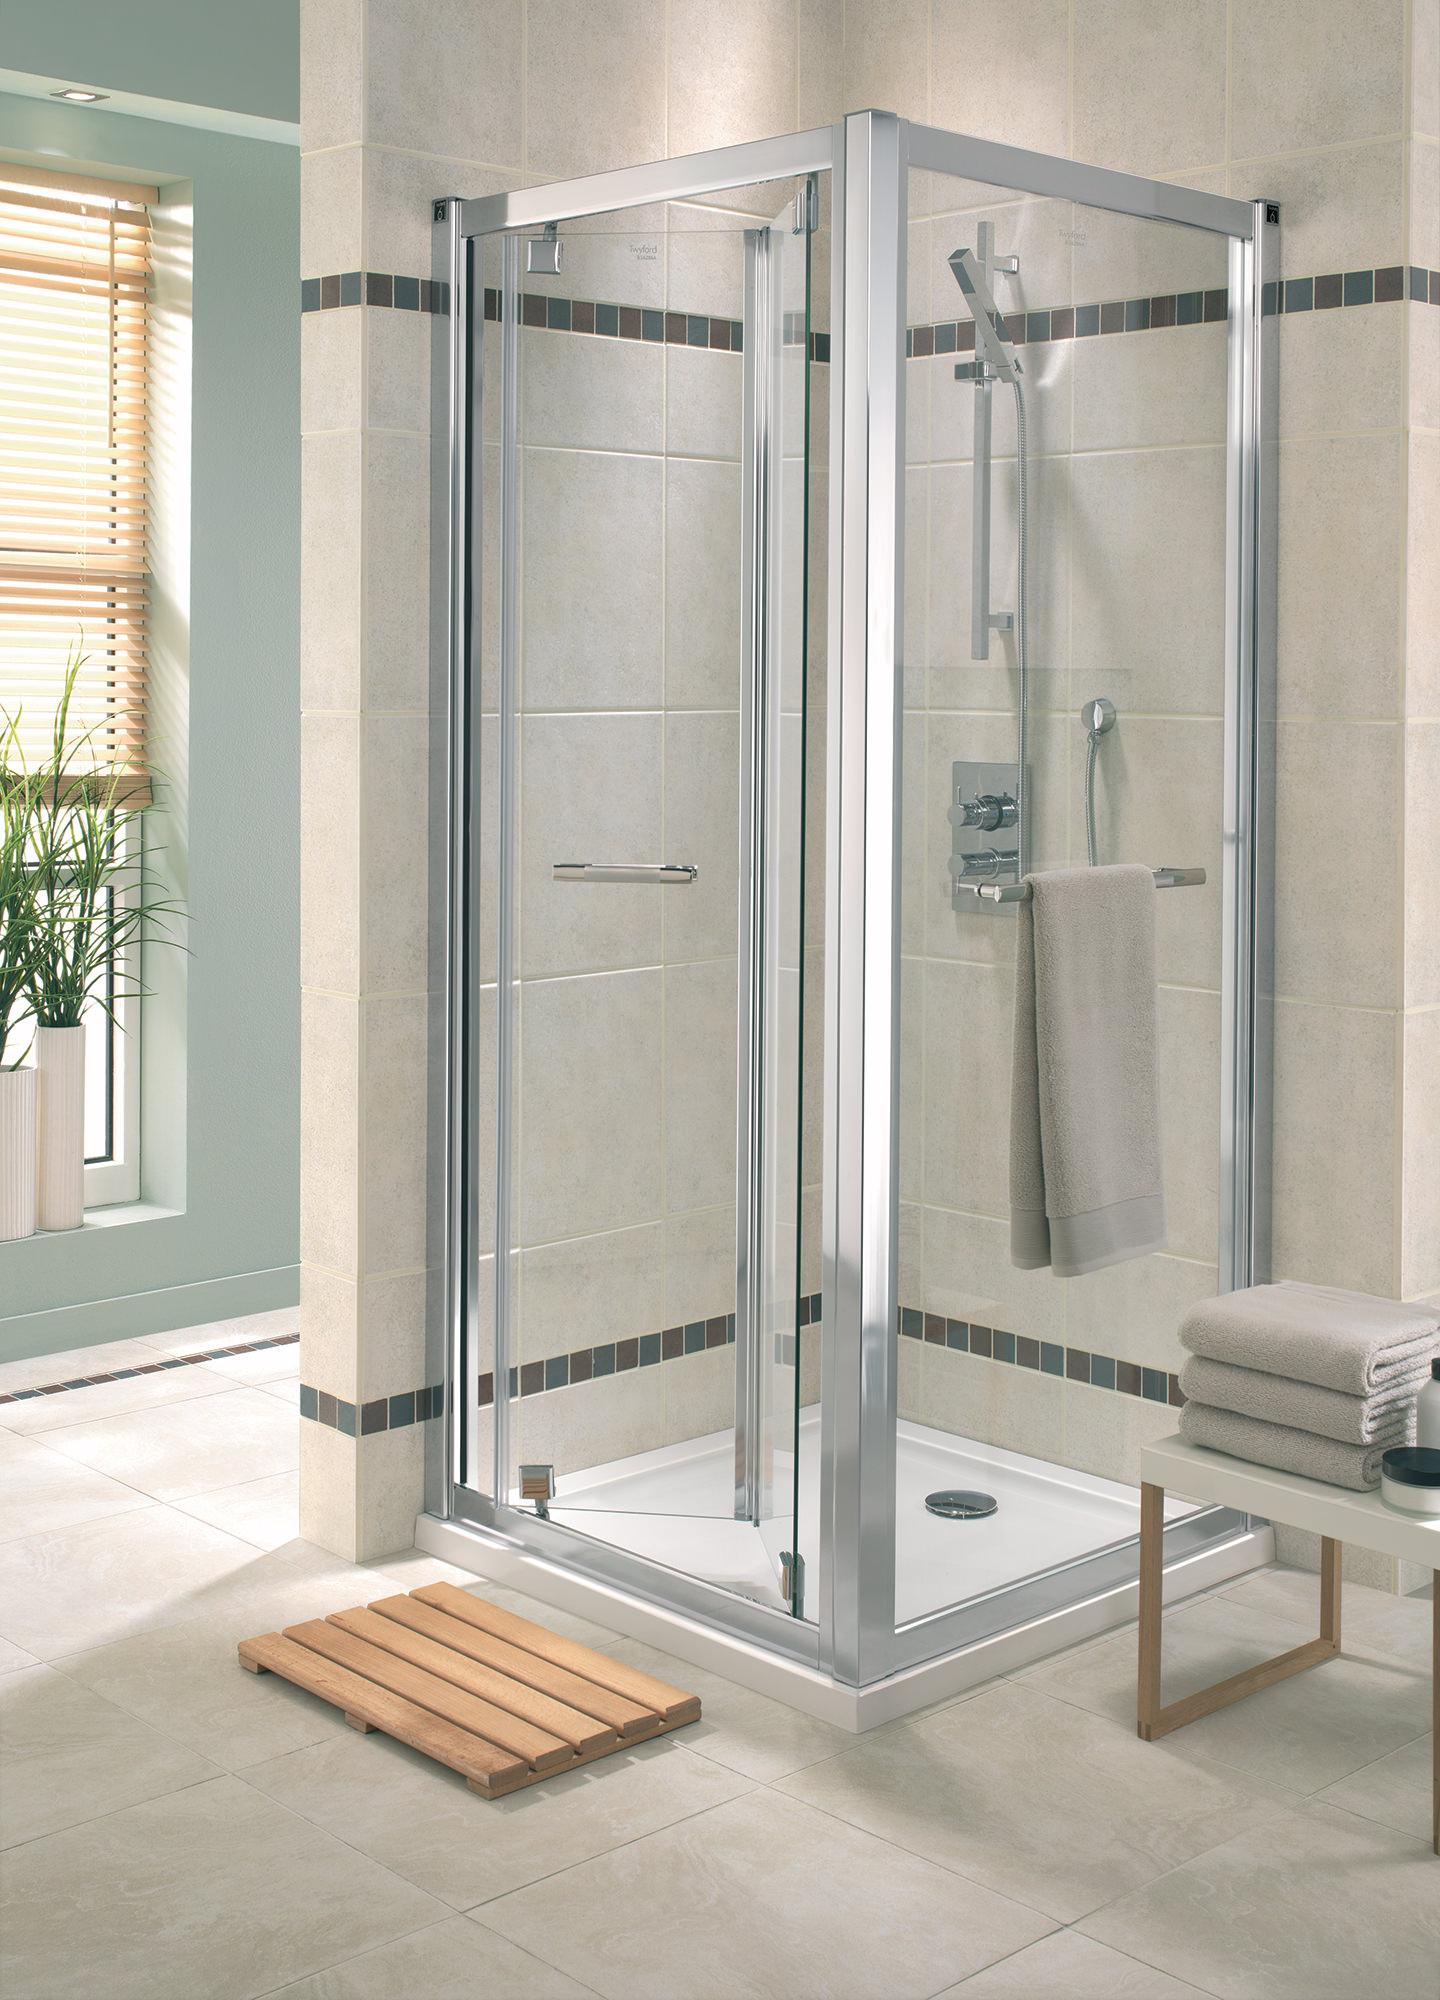 Twyford geo6 bi fold shower enclosure door 900mm g65200cp for Folding shower for small bathrooms